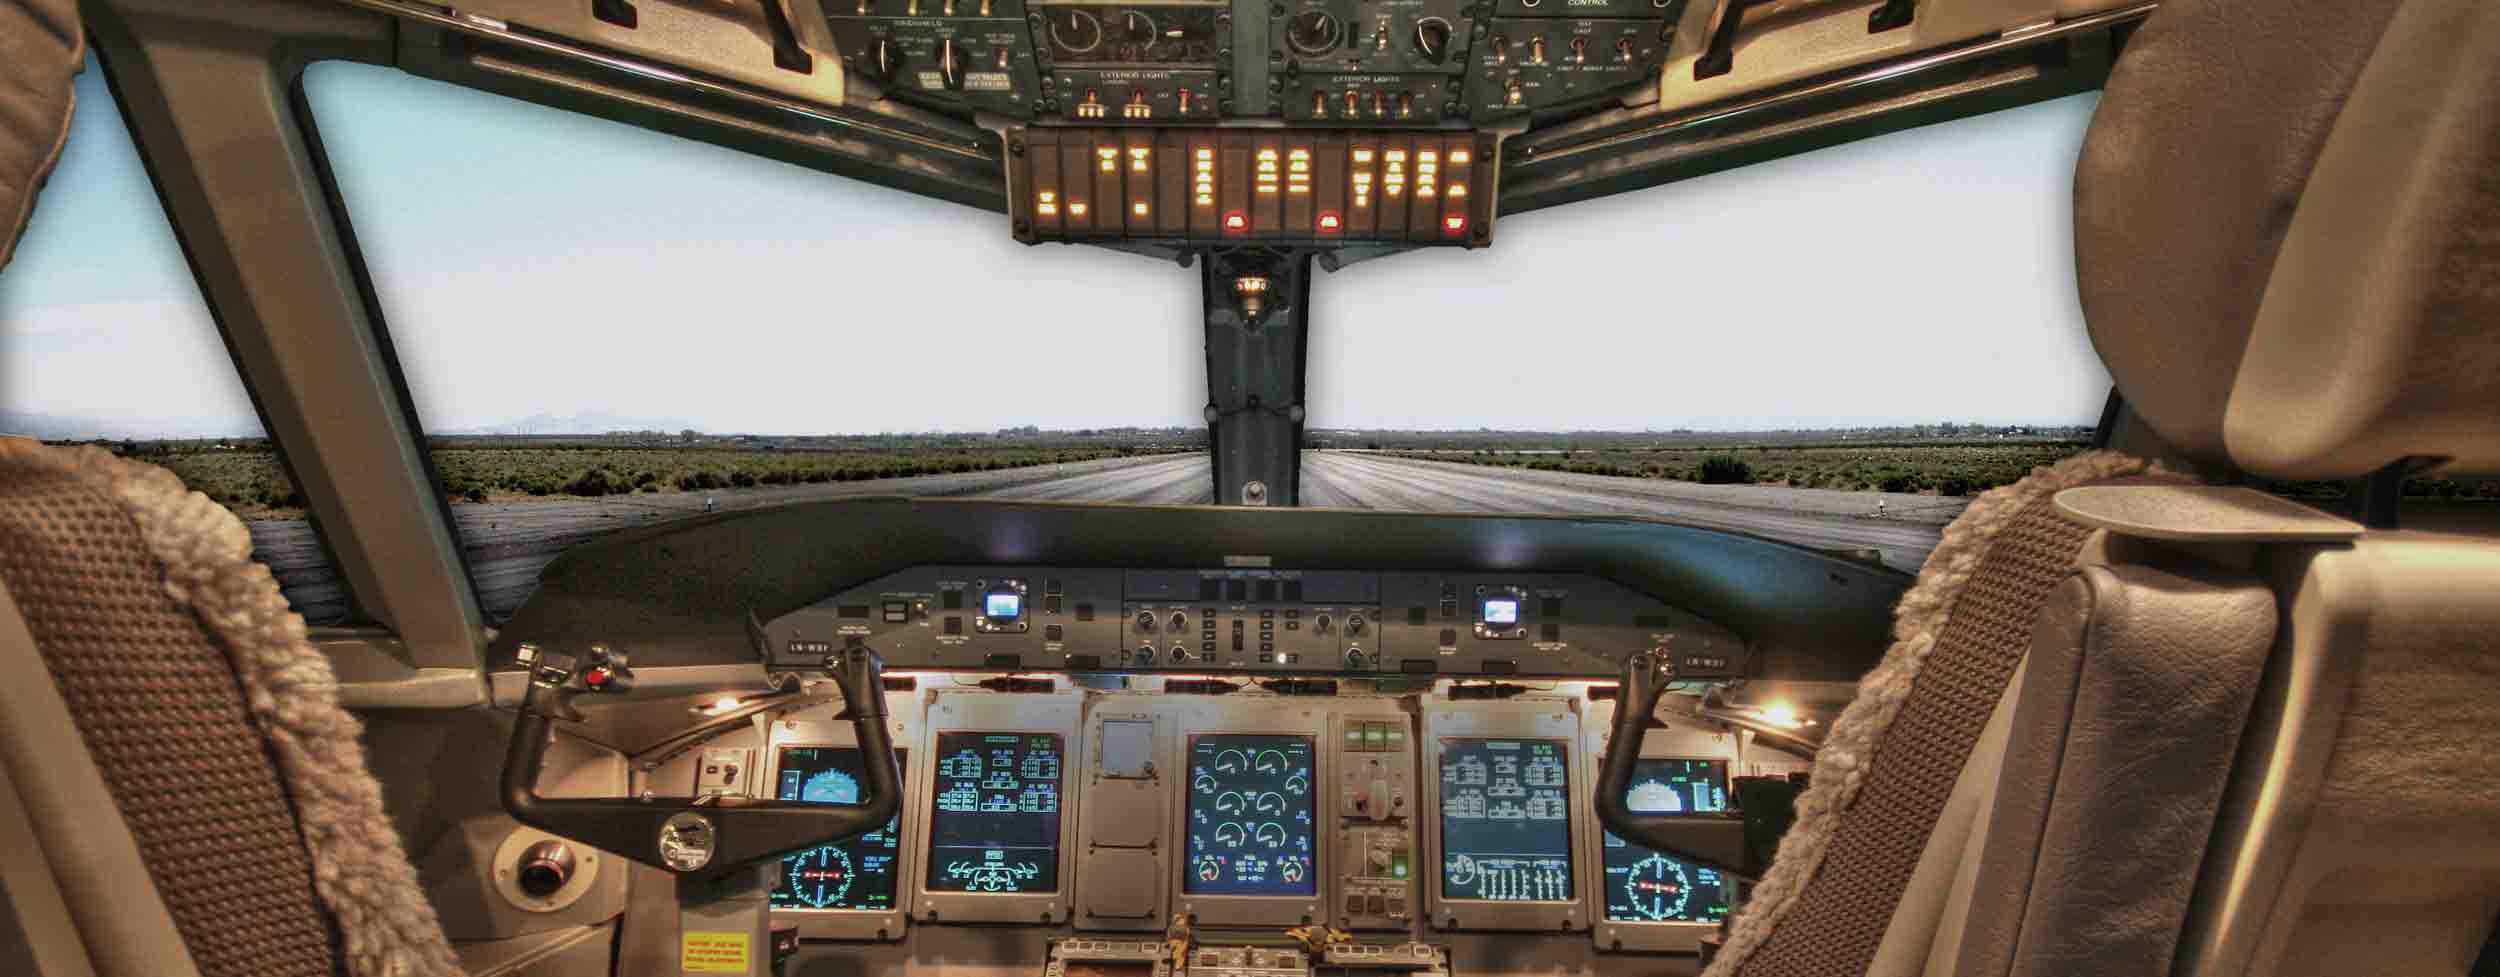 An airplane cockpit